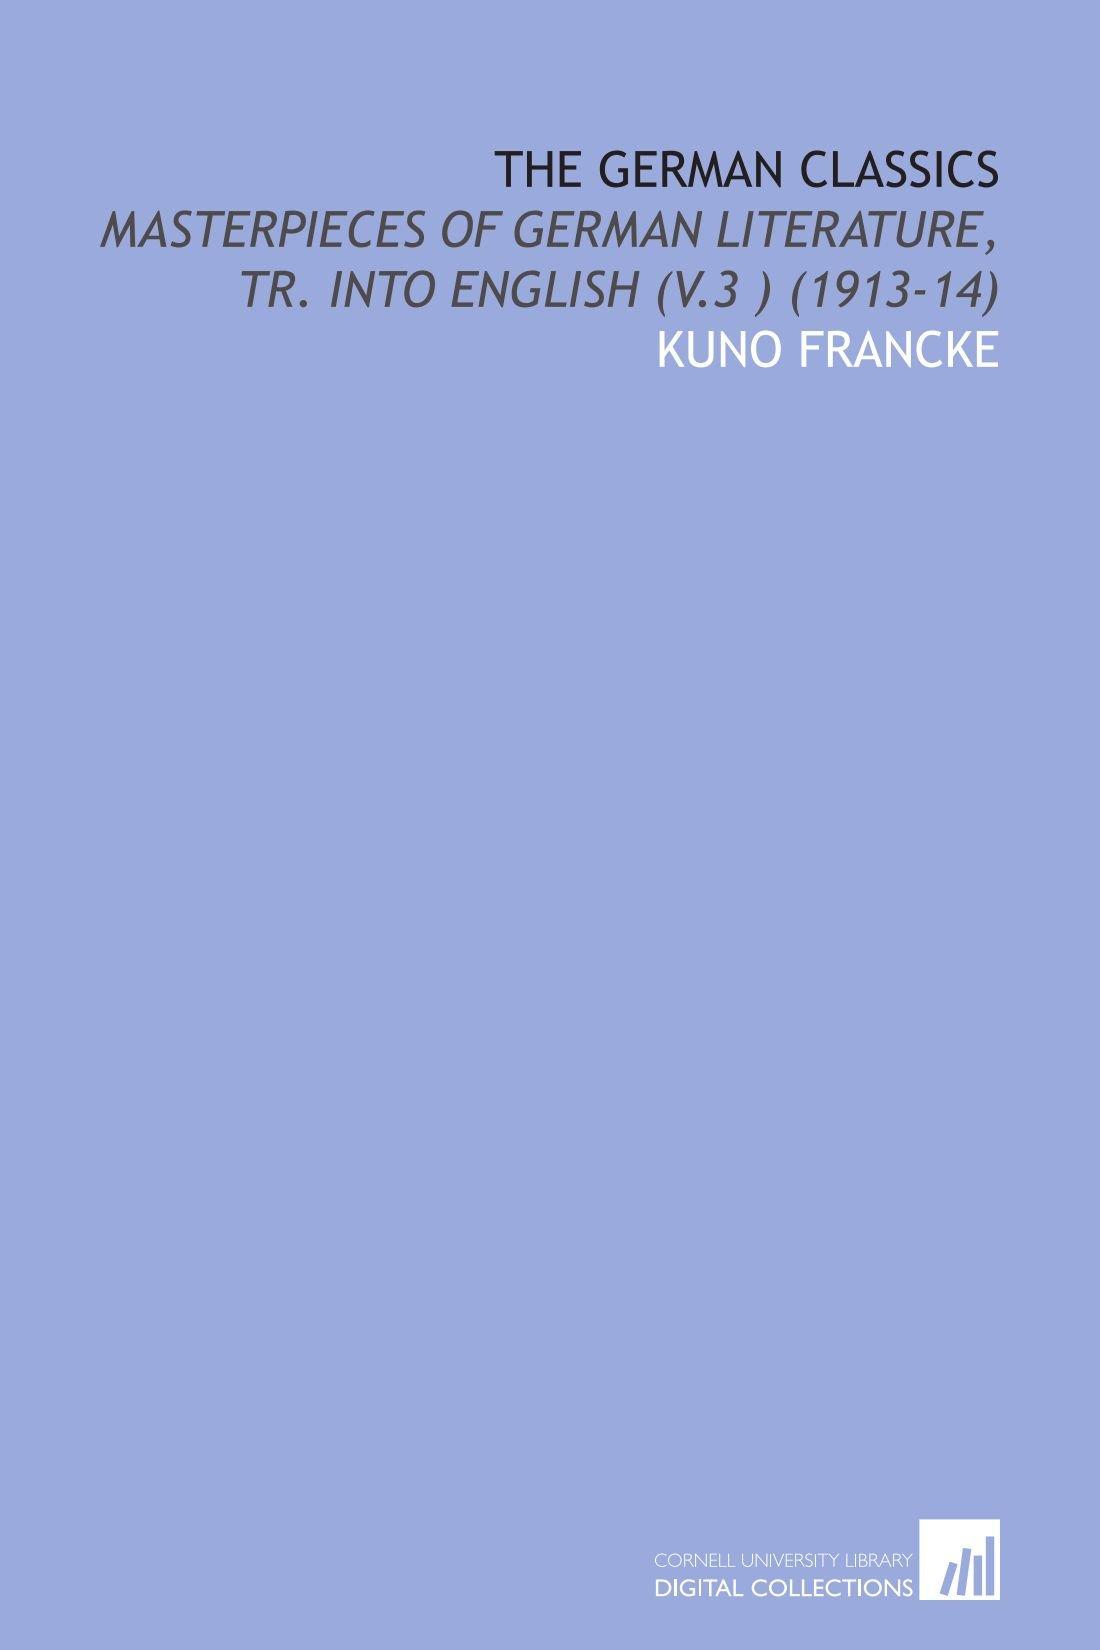 Download The German Classics: Masterpieces of German Literature, Tr. Into English (V.3 ) (1913-14) ebook